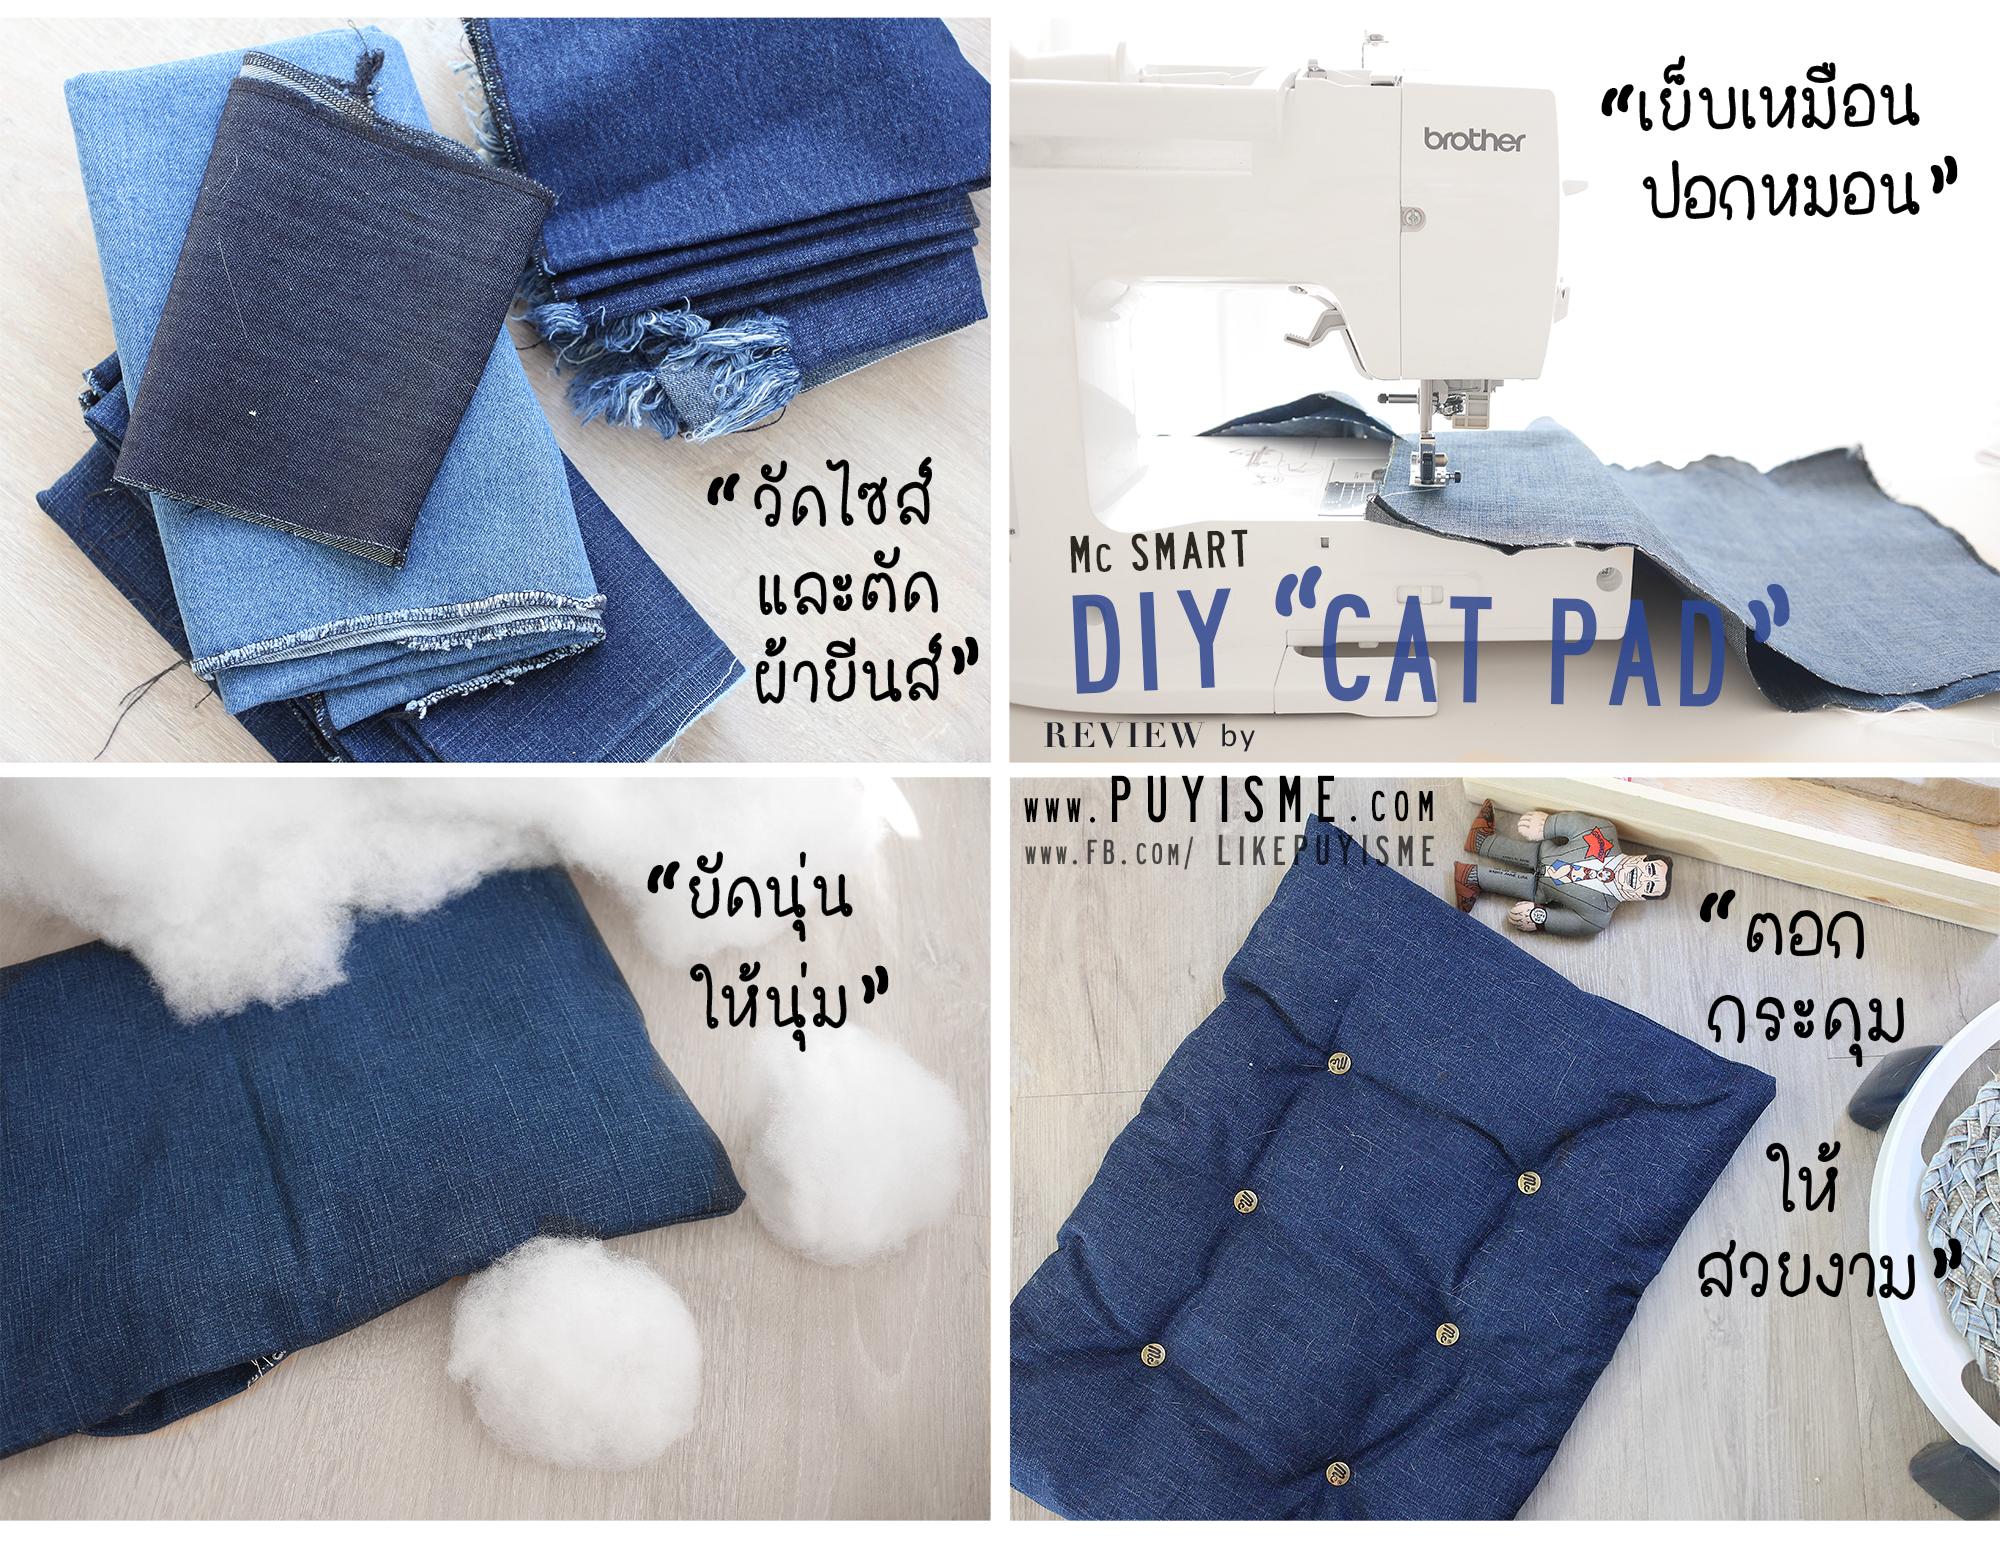 DIY Cat Pad Howto 01